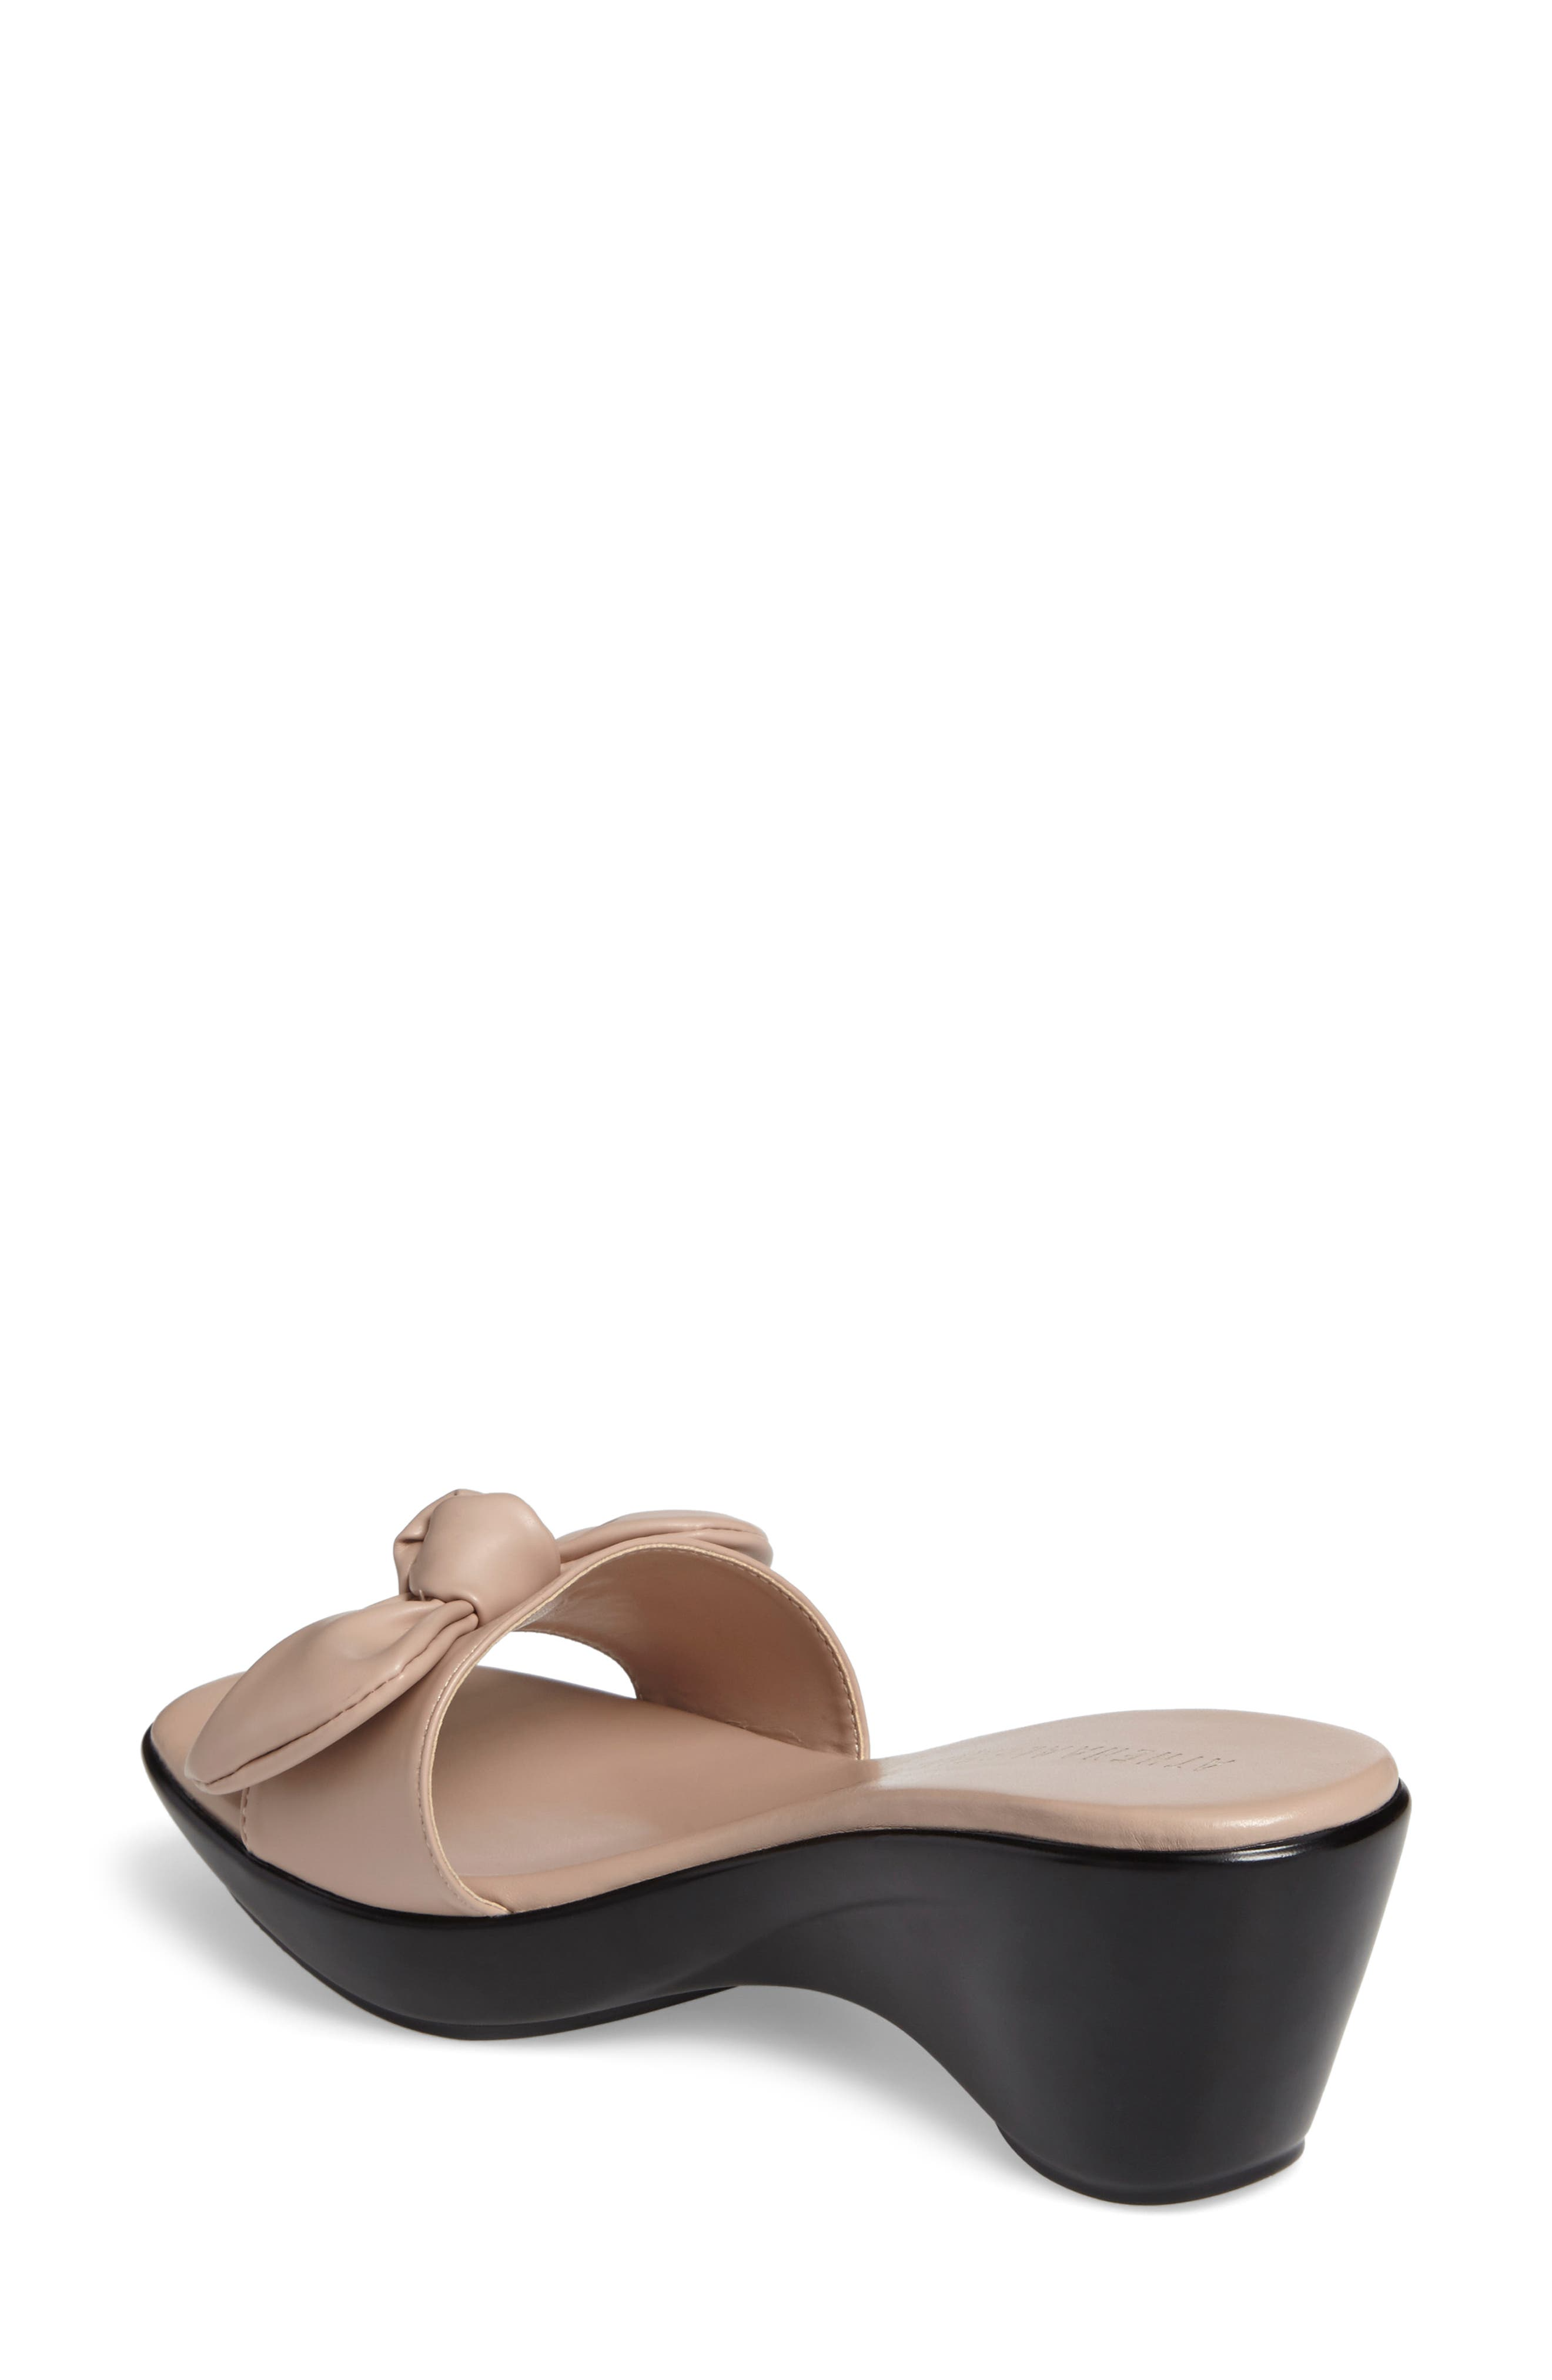 Pattye Knotted Slide Sandal,                             Alternate thumbnail 2, color,                             Blush Faux Leather